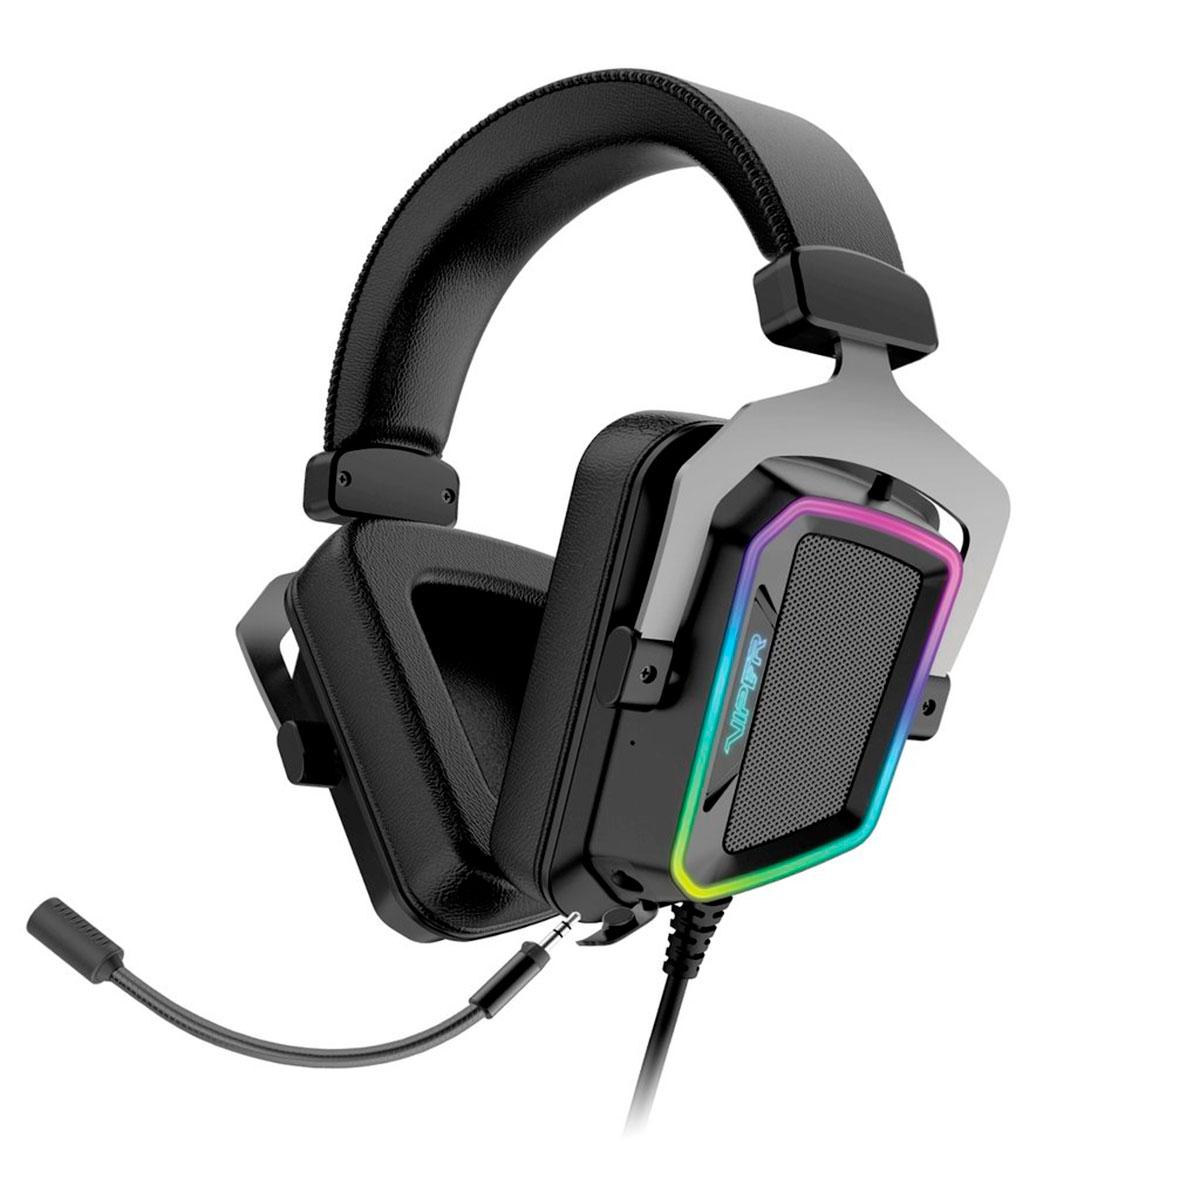 Headset Gamer Patriot Viper V380, USB, 7.1 Virtual Surround Sound, Cancelamento de ruidos, RGB